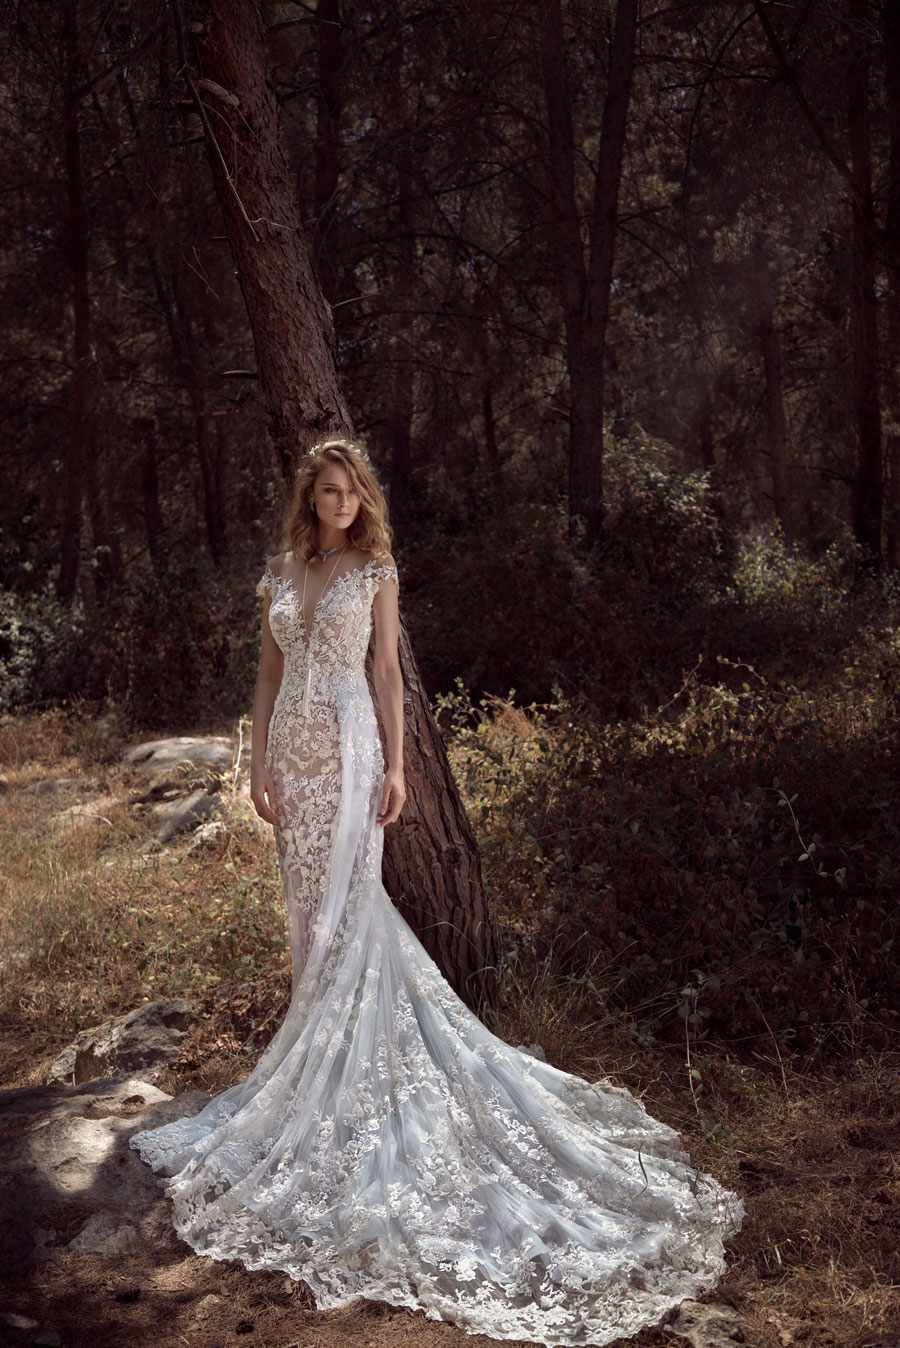 Wedding Dresses for the Urban-Boho Bride- Gala Collection No. IV0002